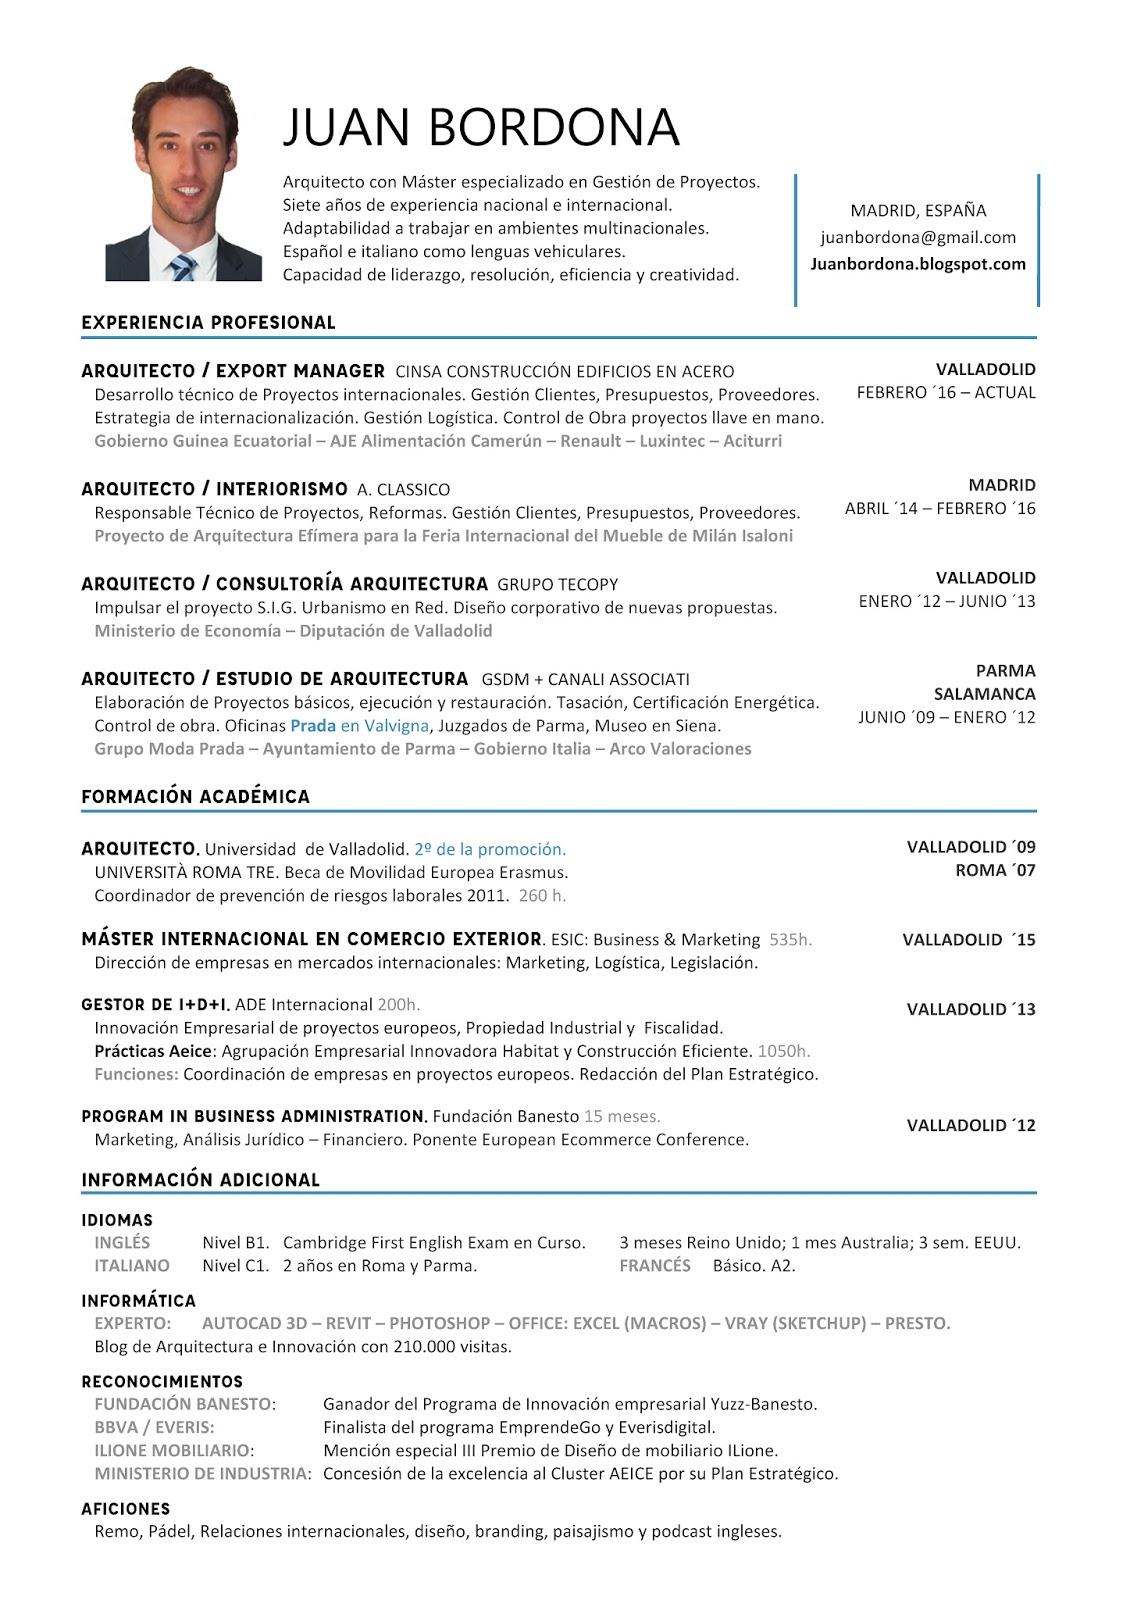 Curriculum Vitae Arquitecto Juan Bordona | Juan Sanchez-Bordona